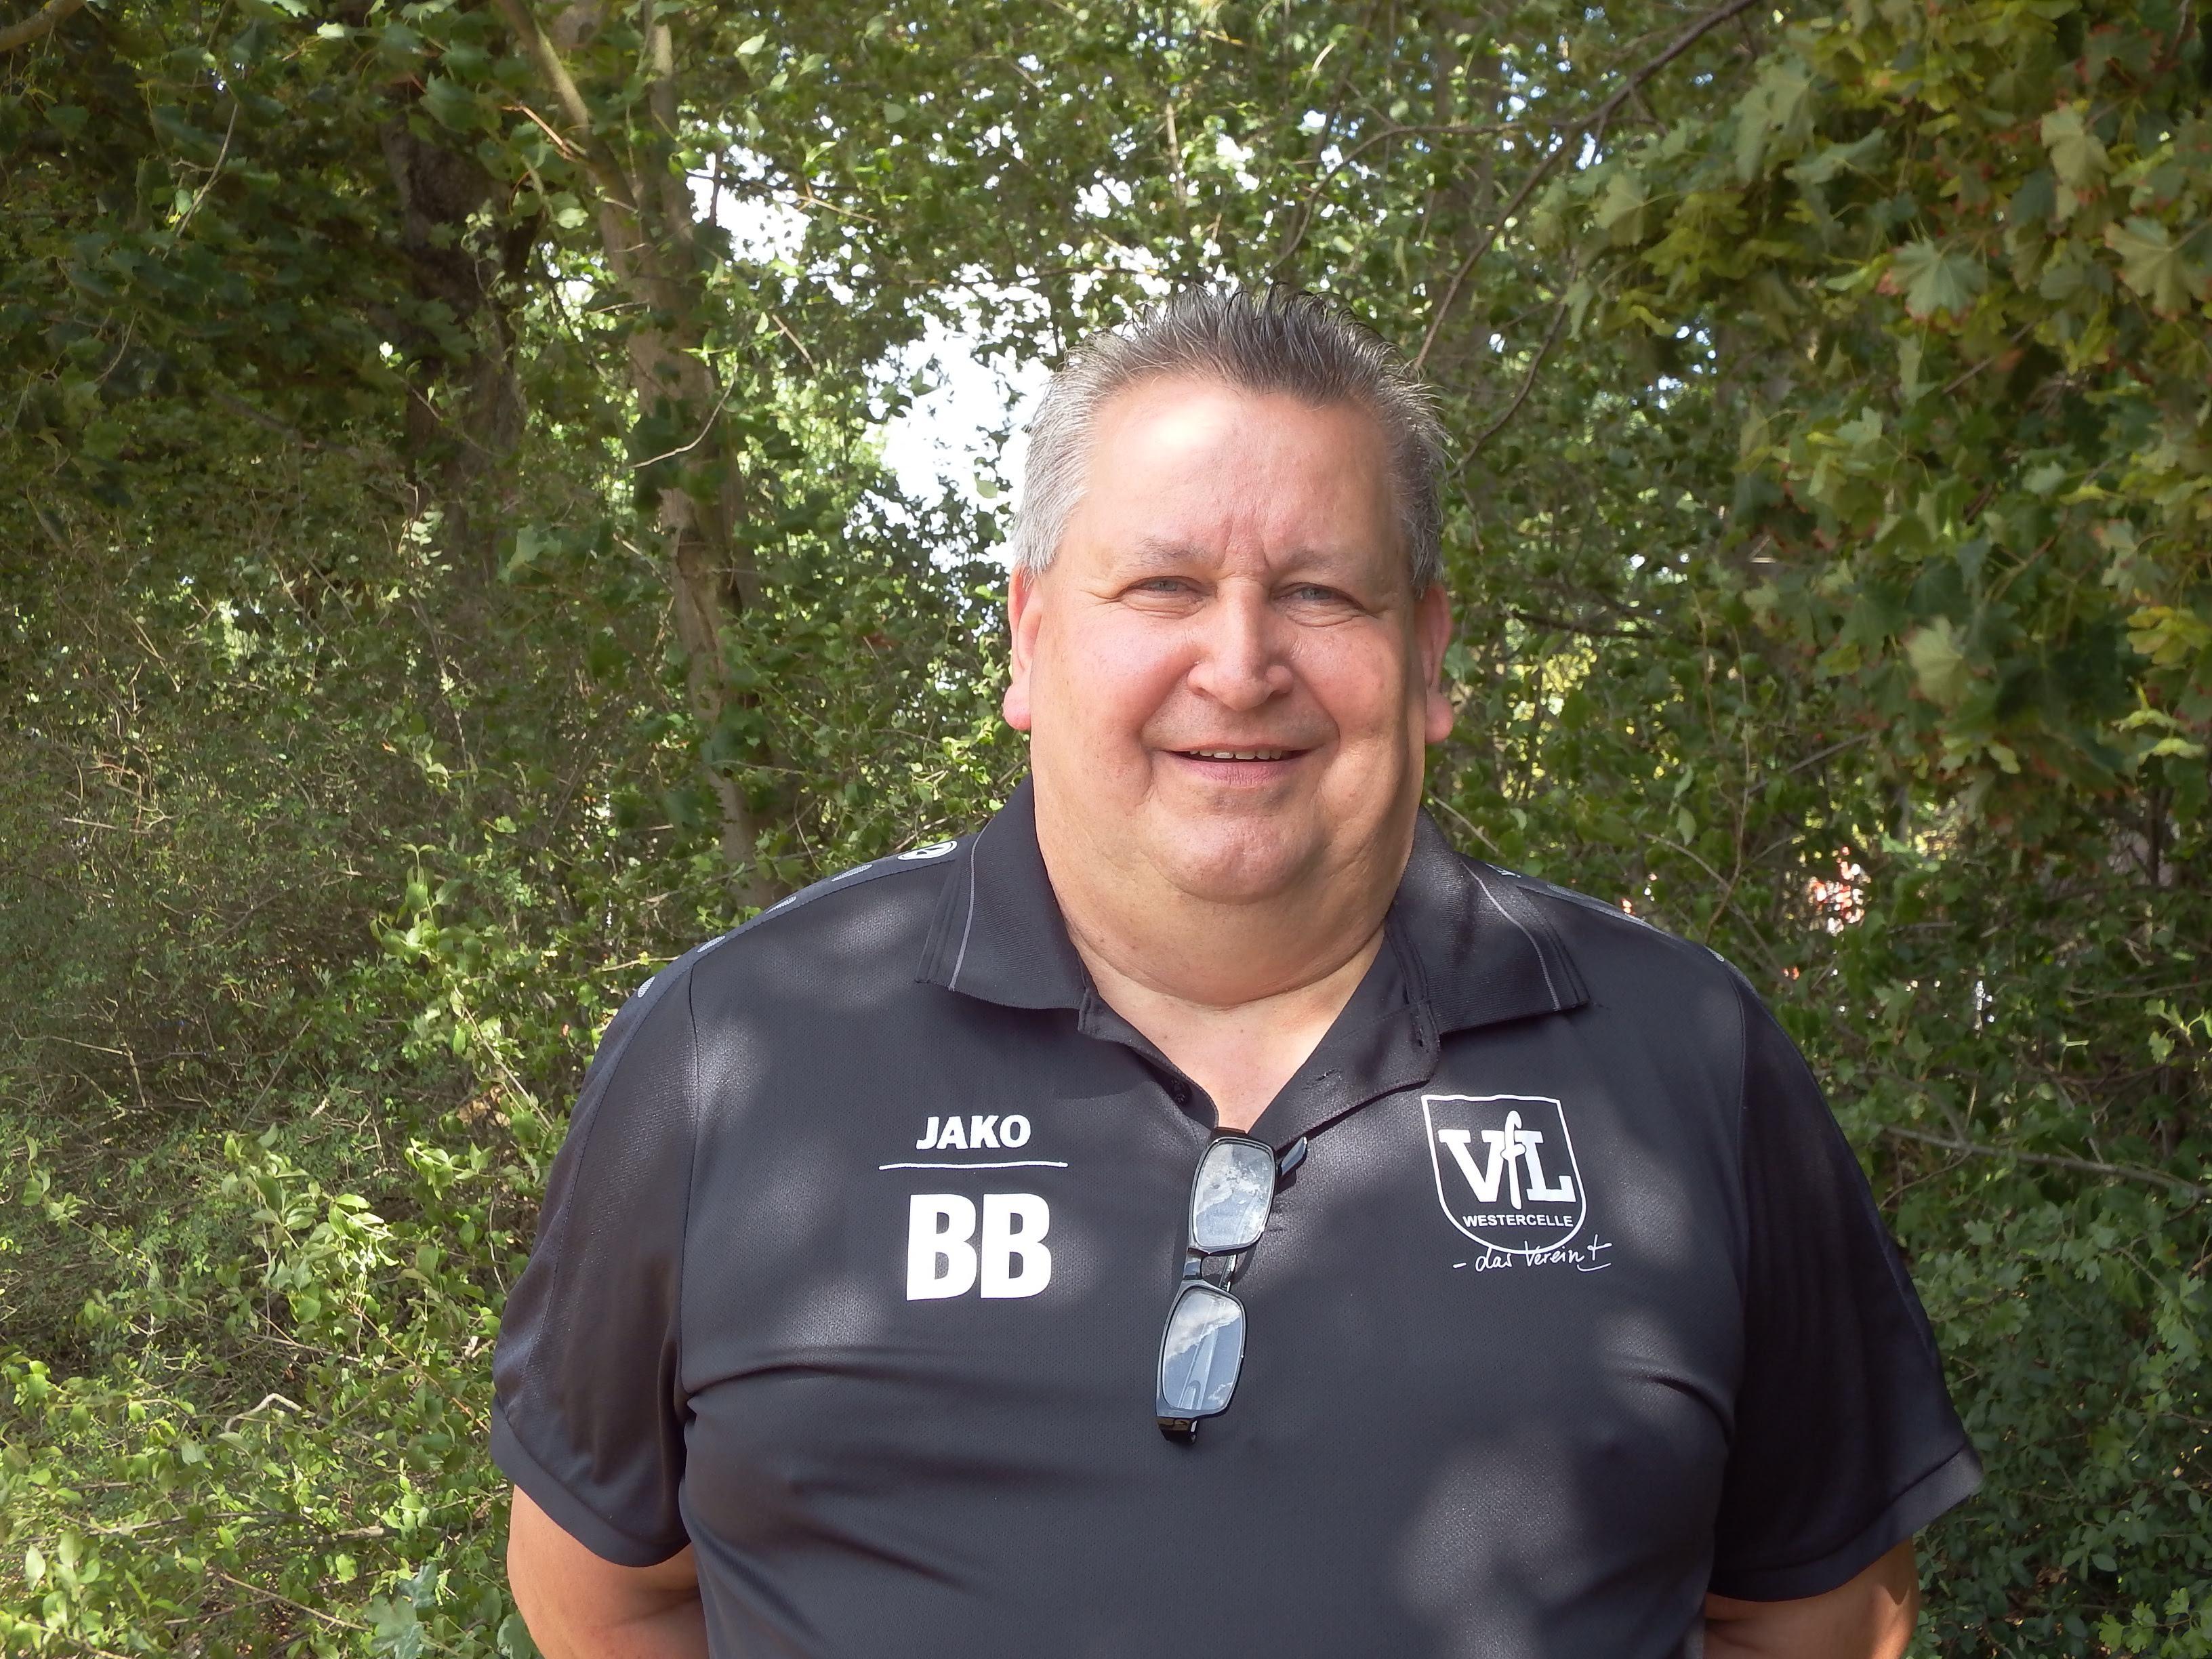 Bernd Brosy